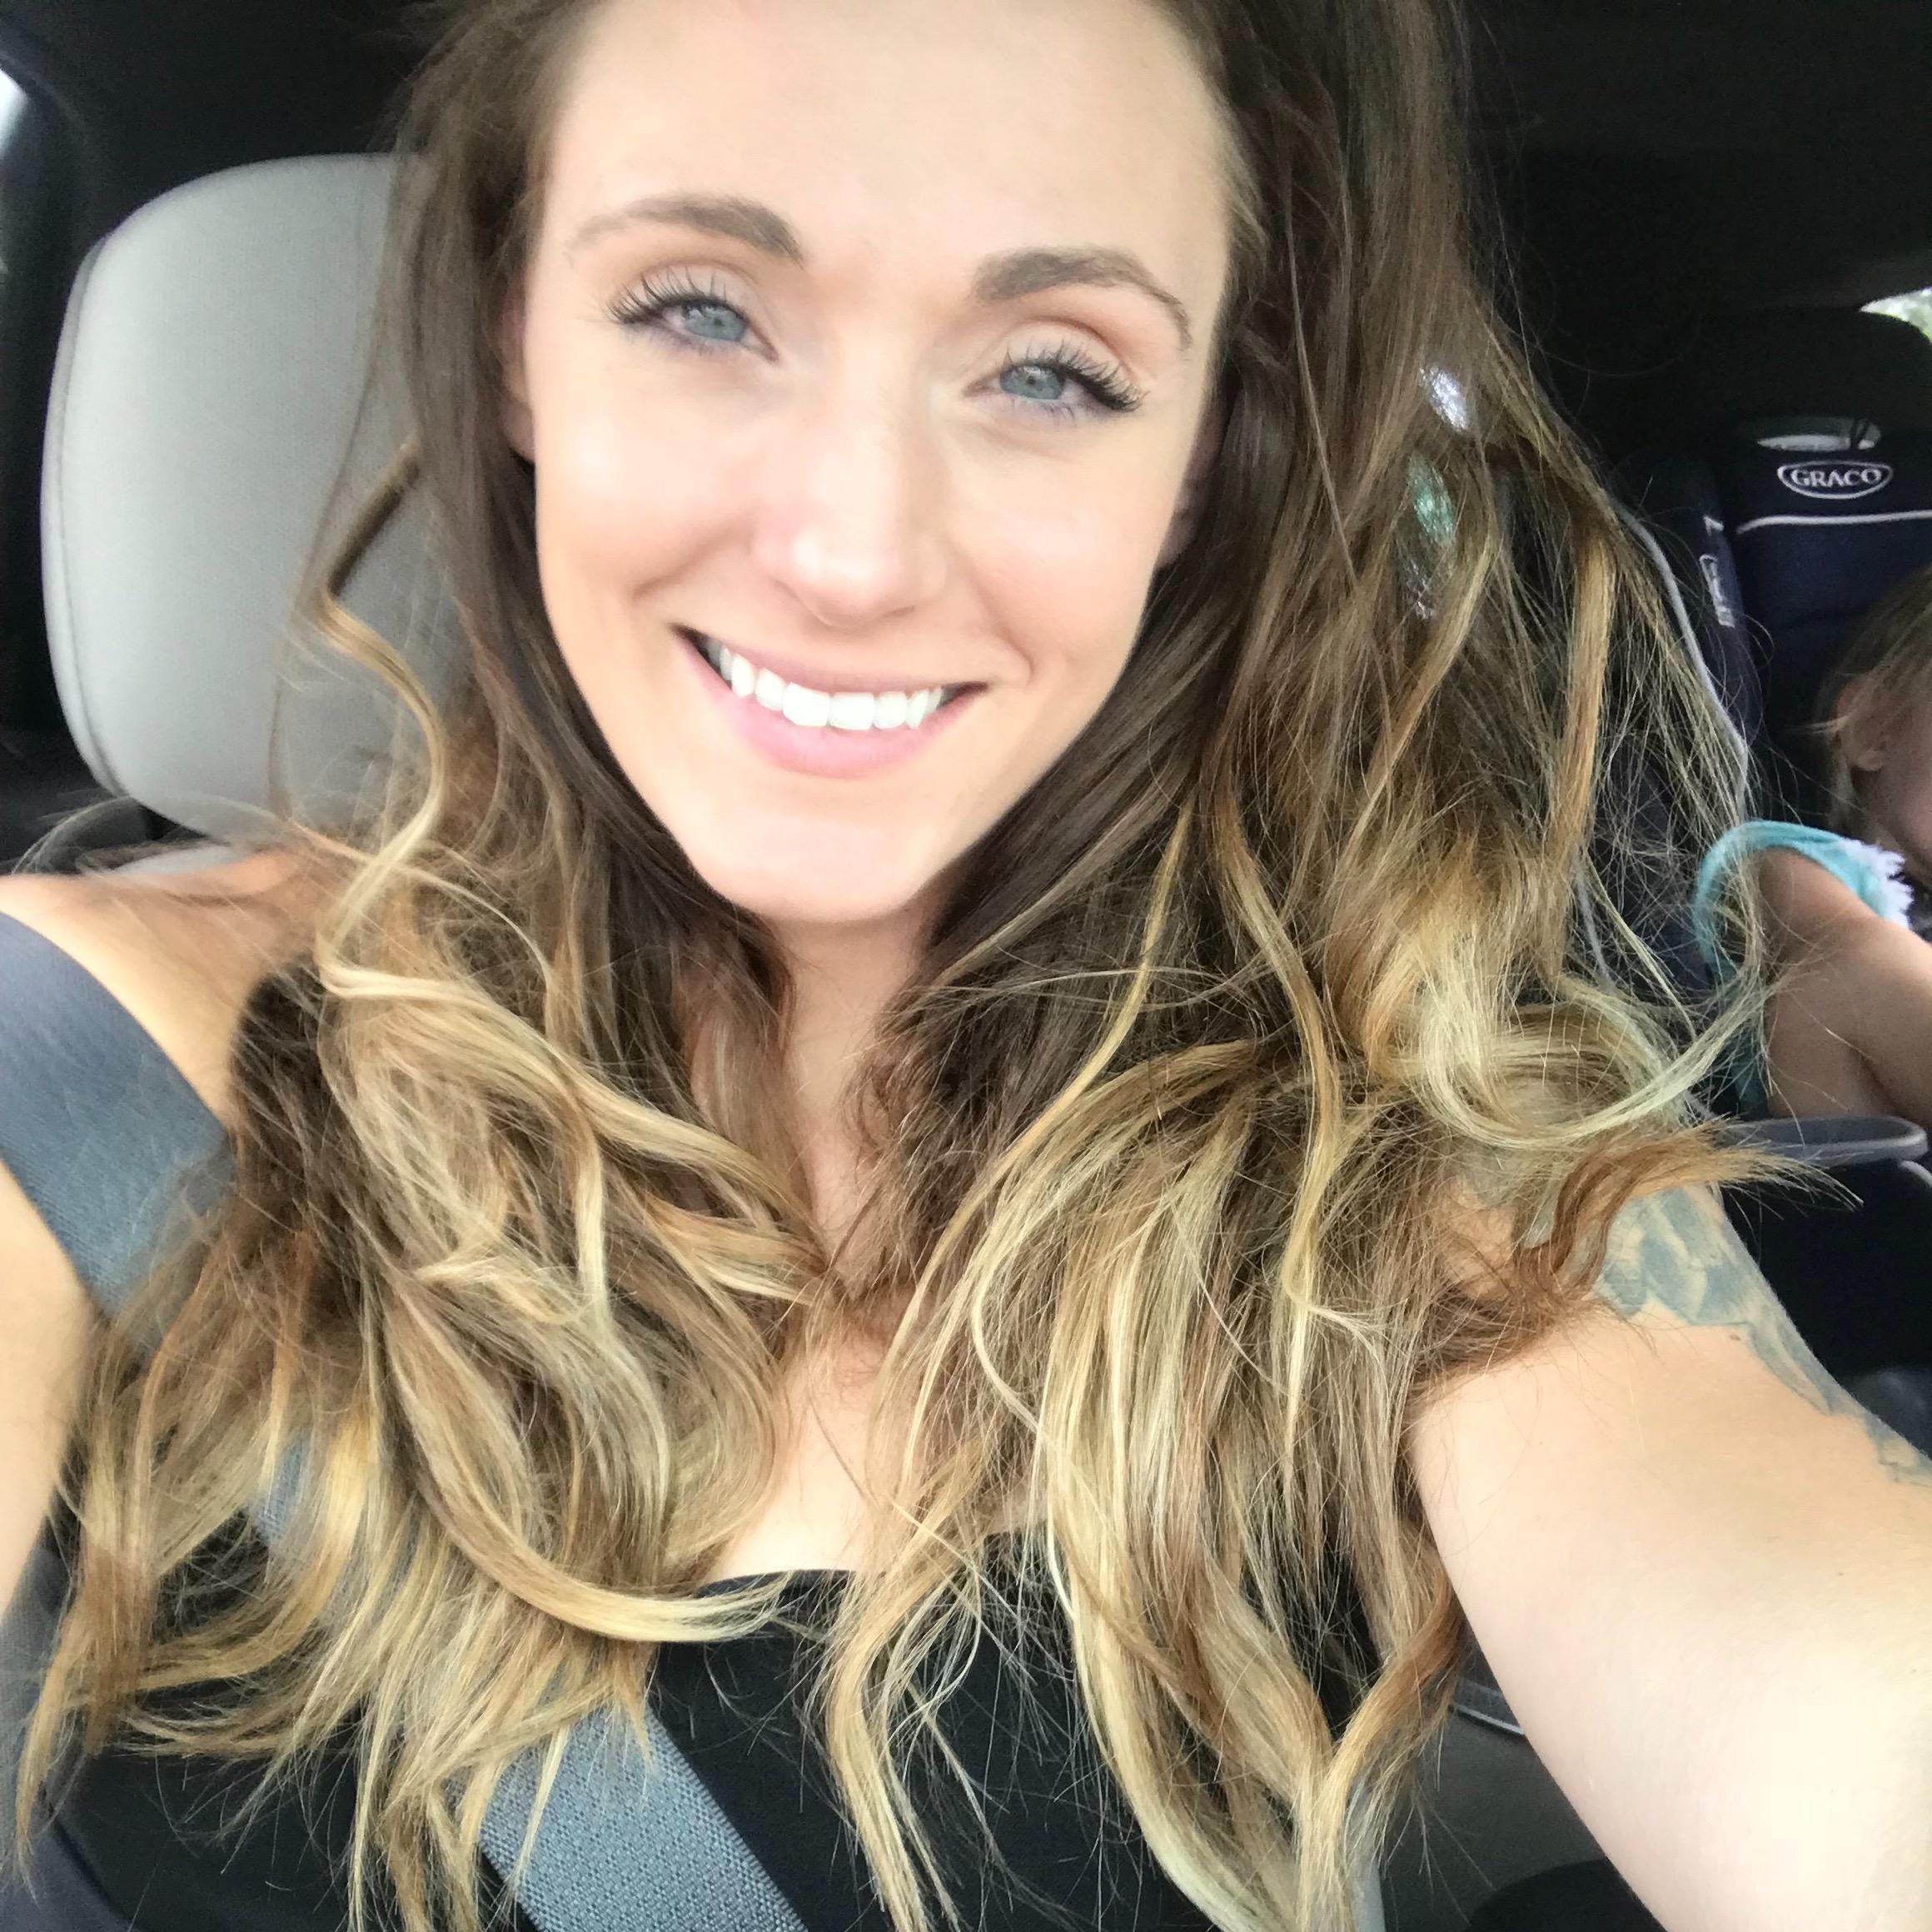 Kayla C.